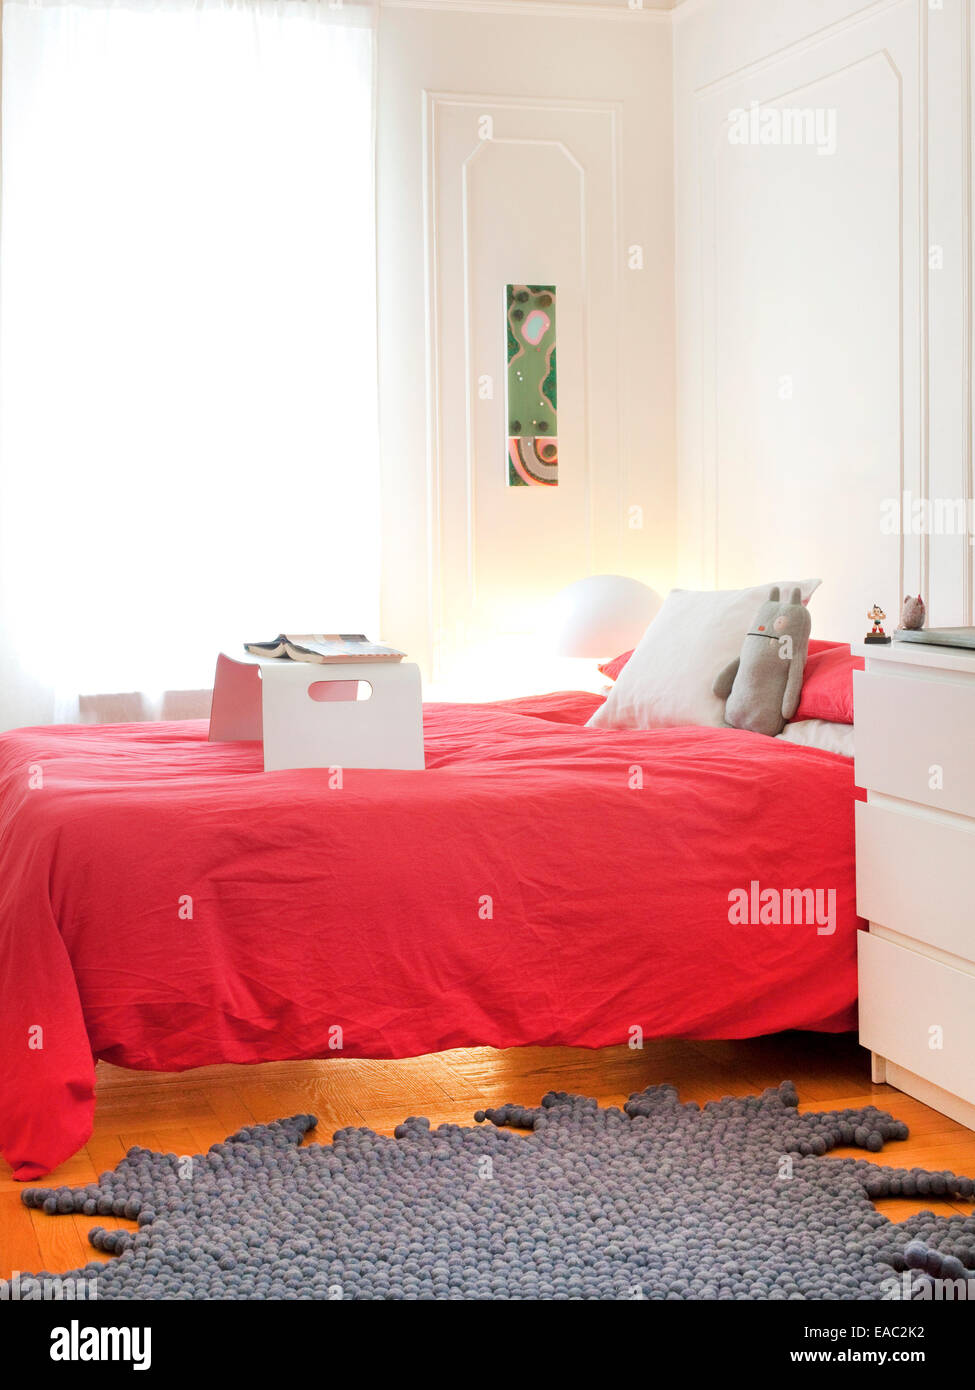 Child's bedroom - Stock Image